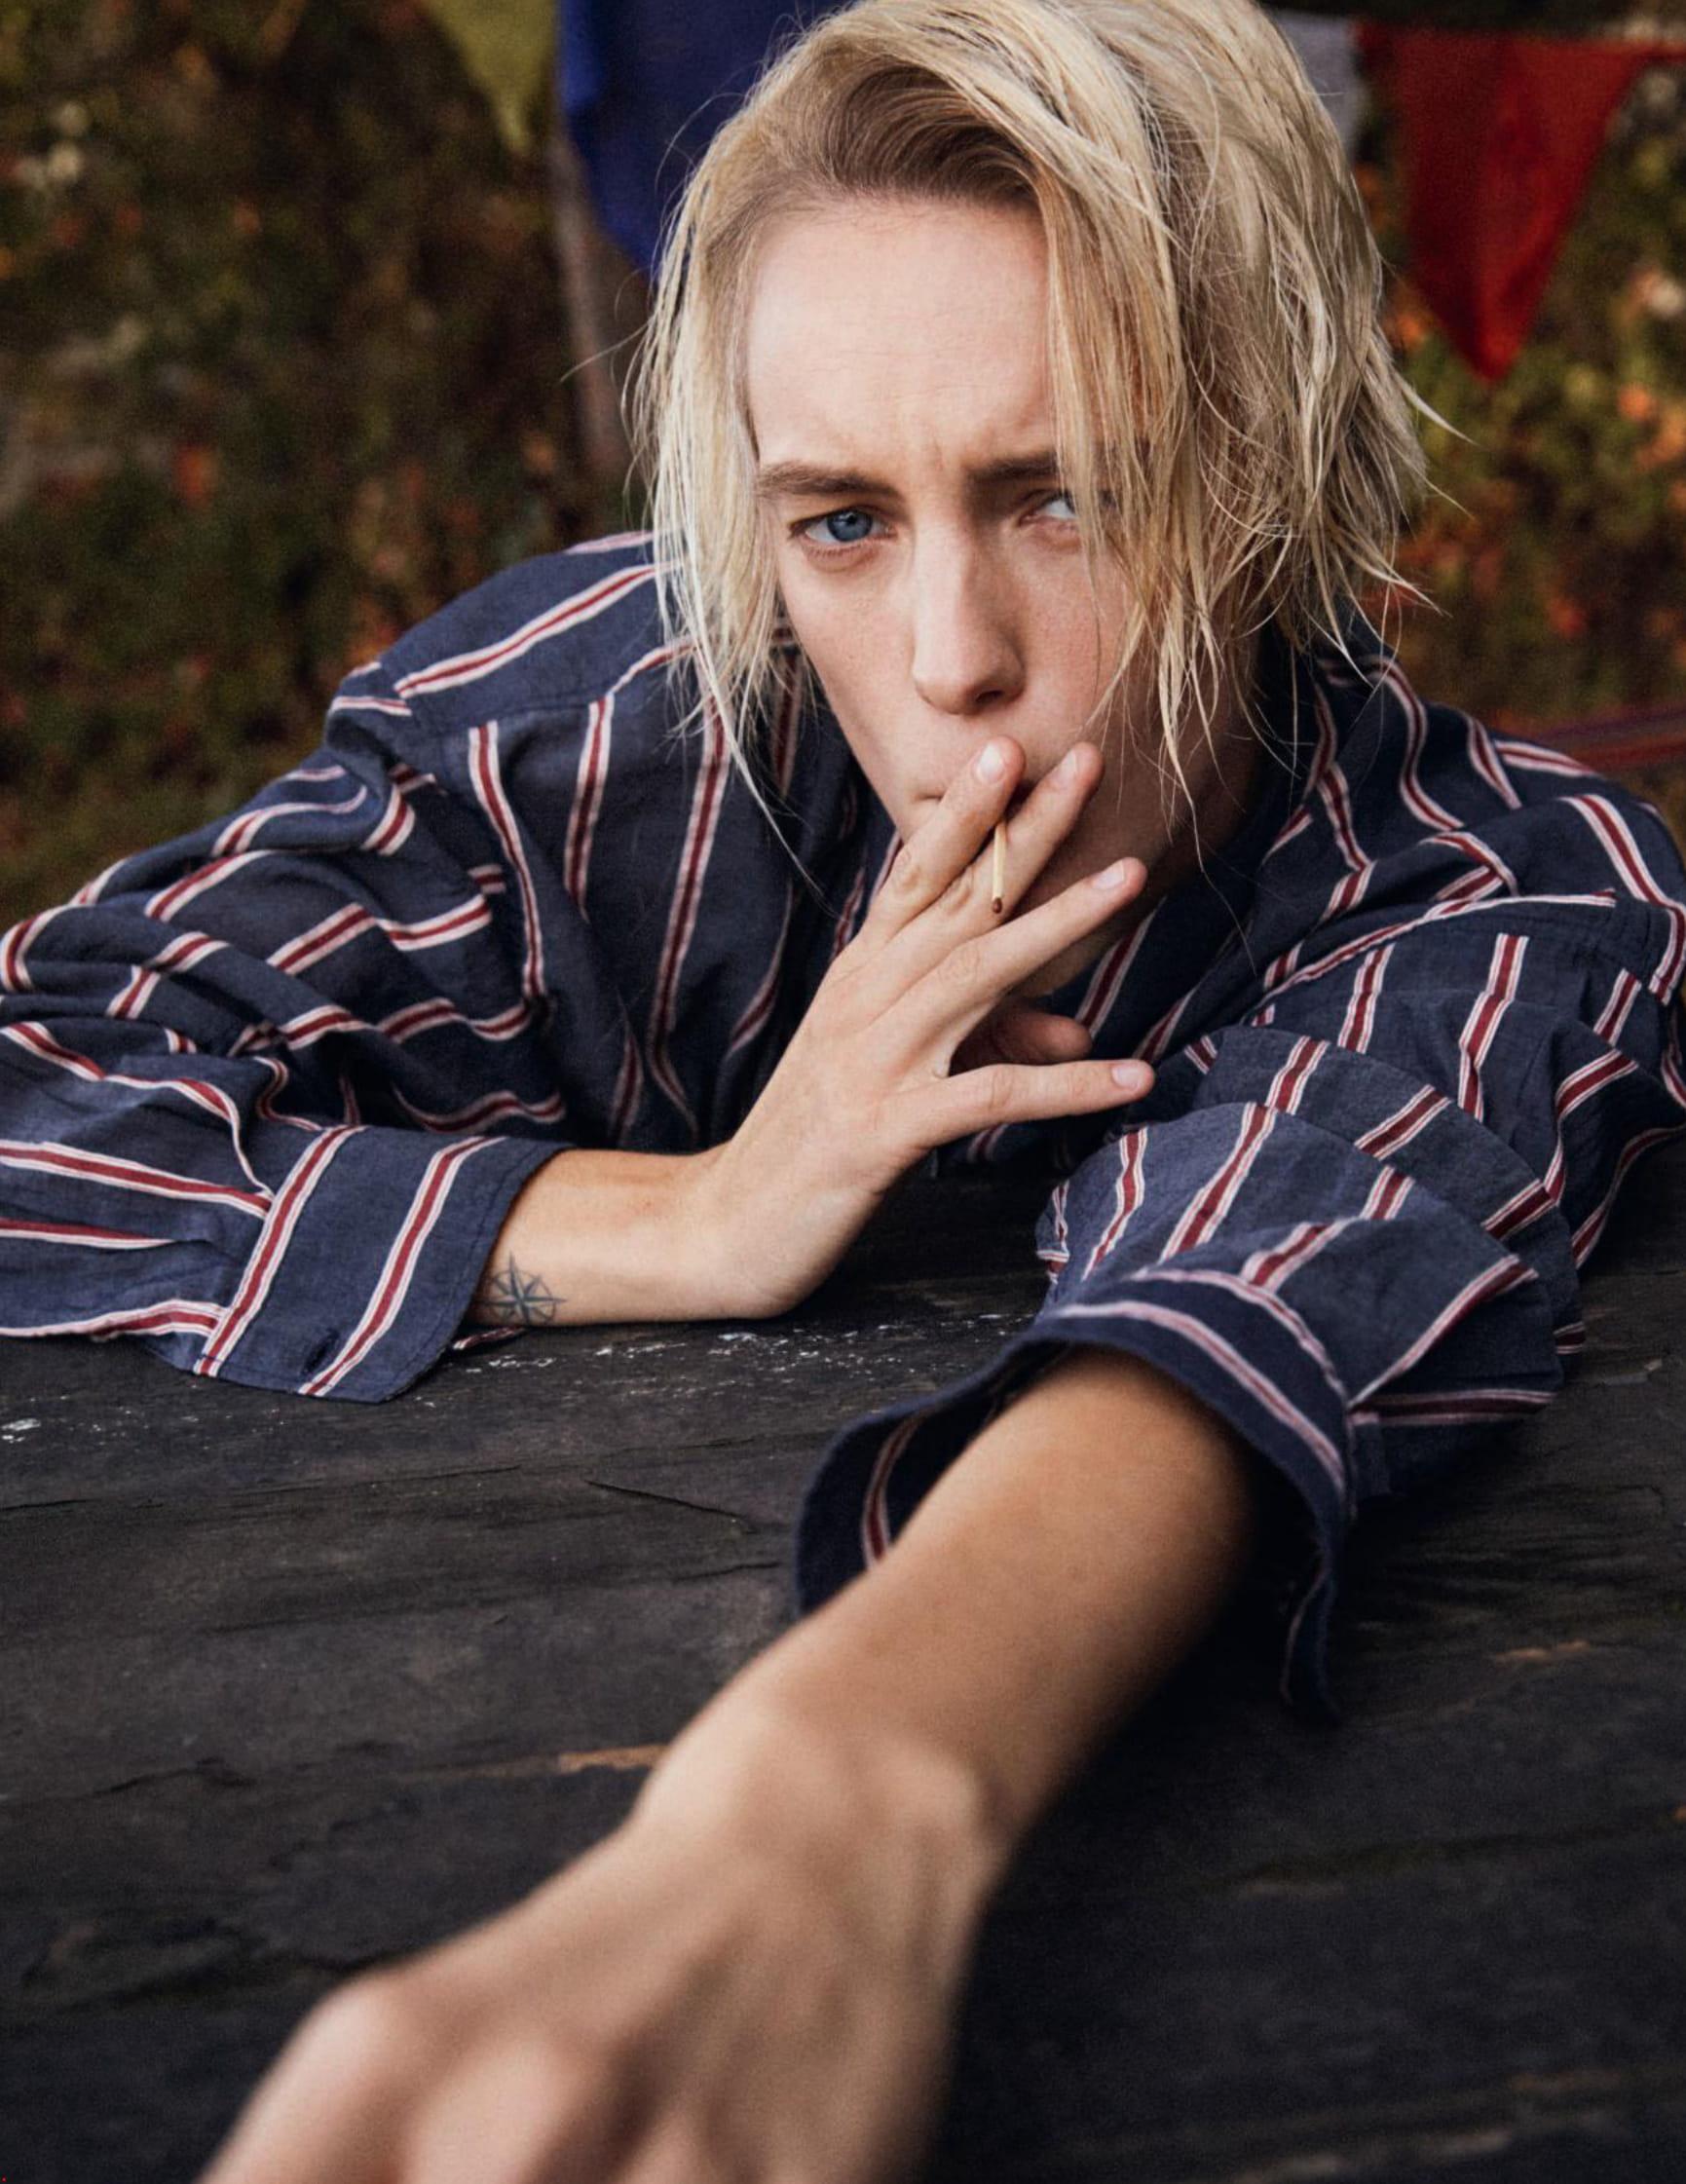 Erika Linder by Mikael Jansson for Vogue Paris Feb 2019 (12).jpg